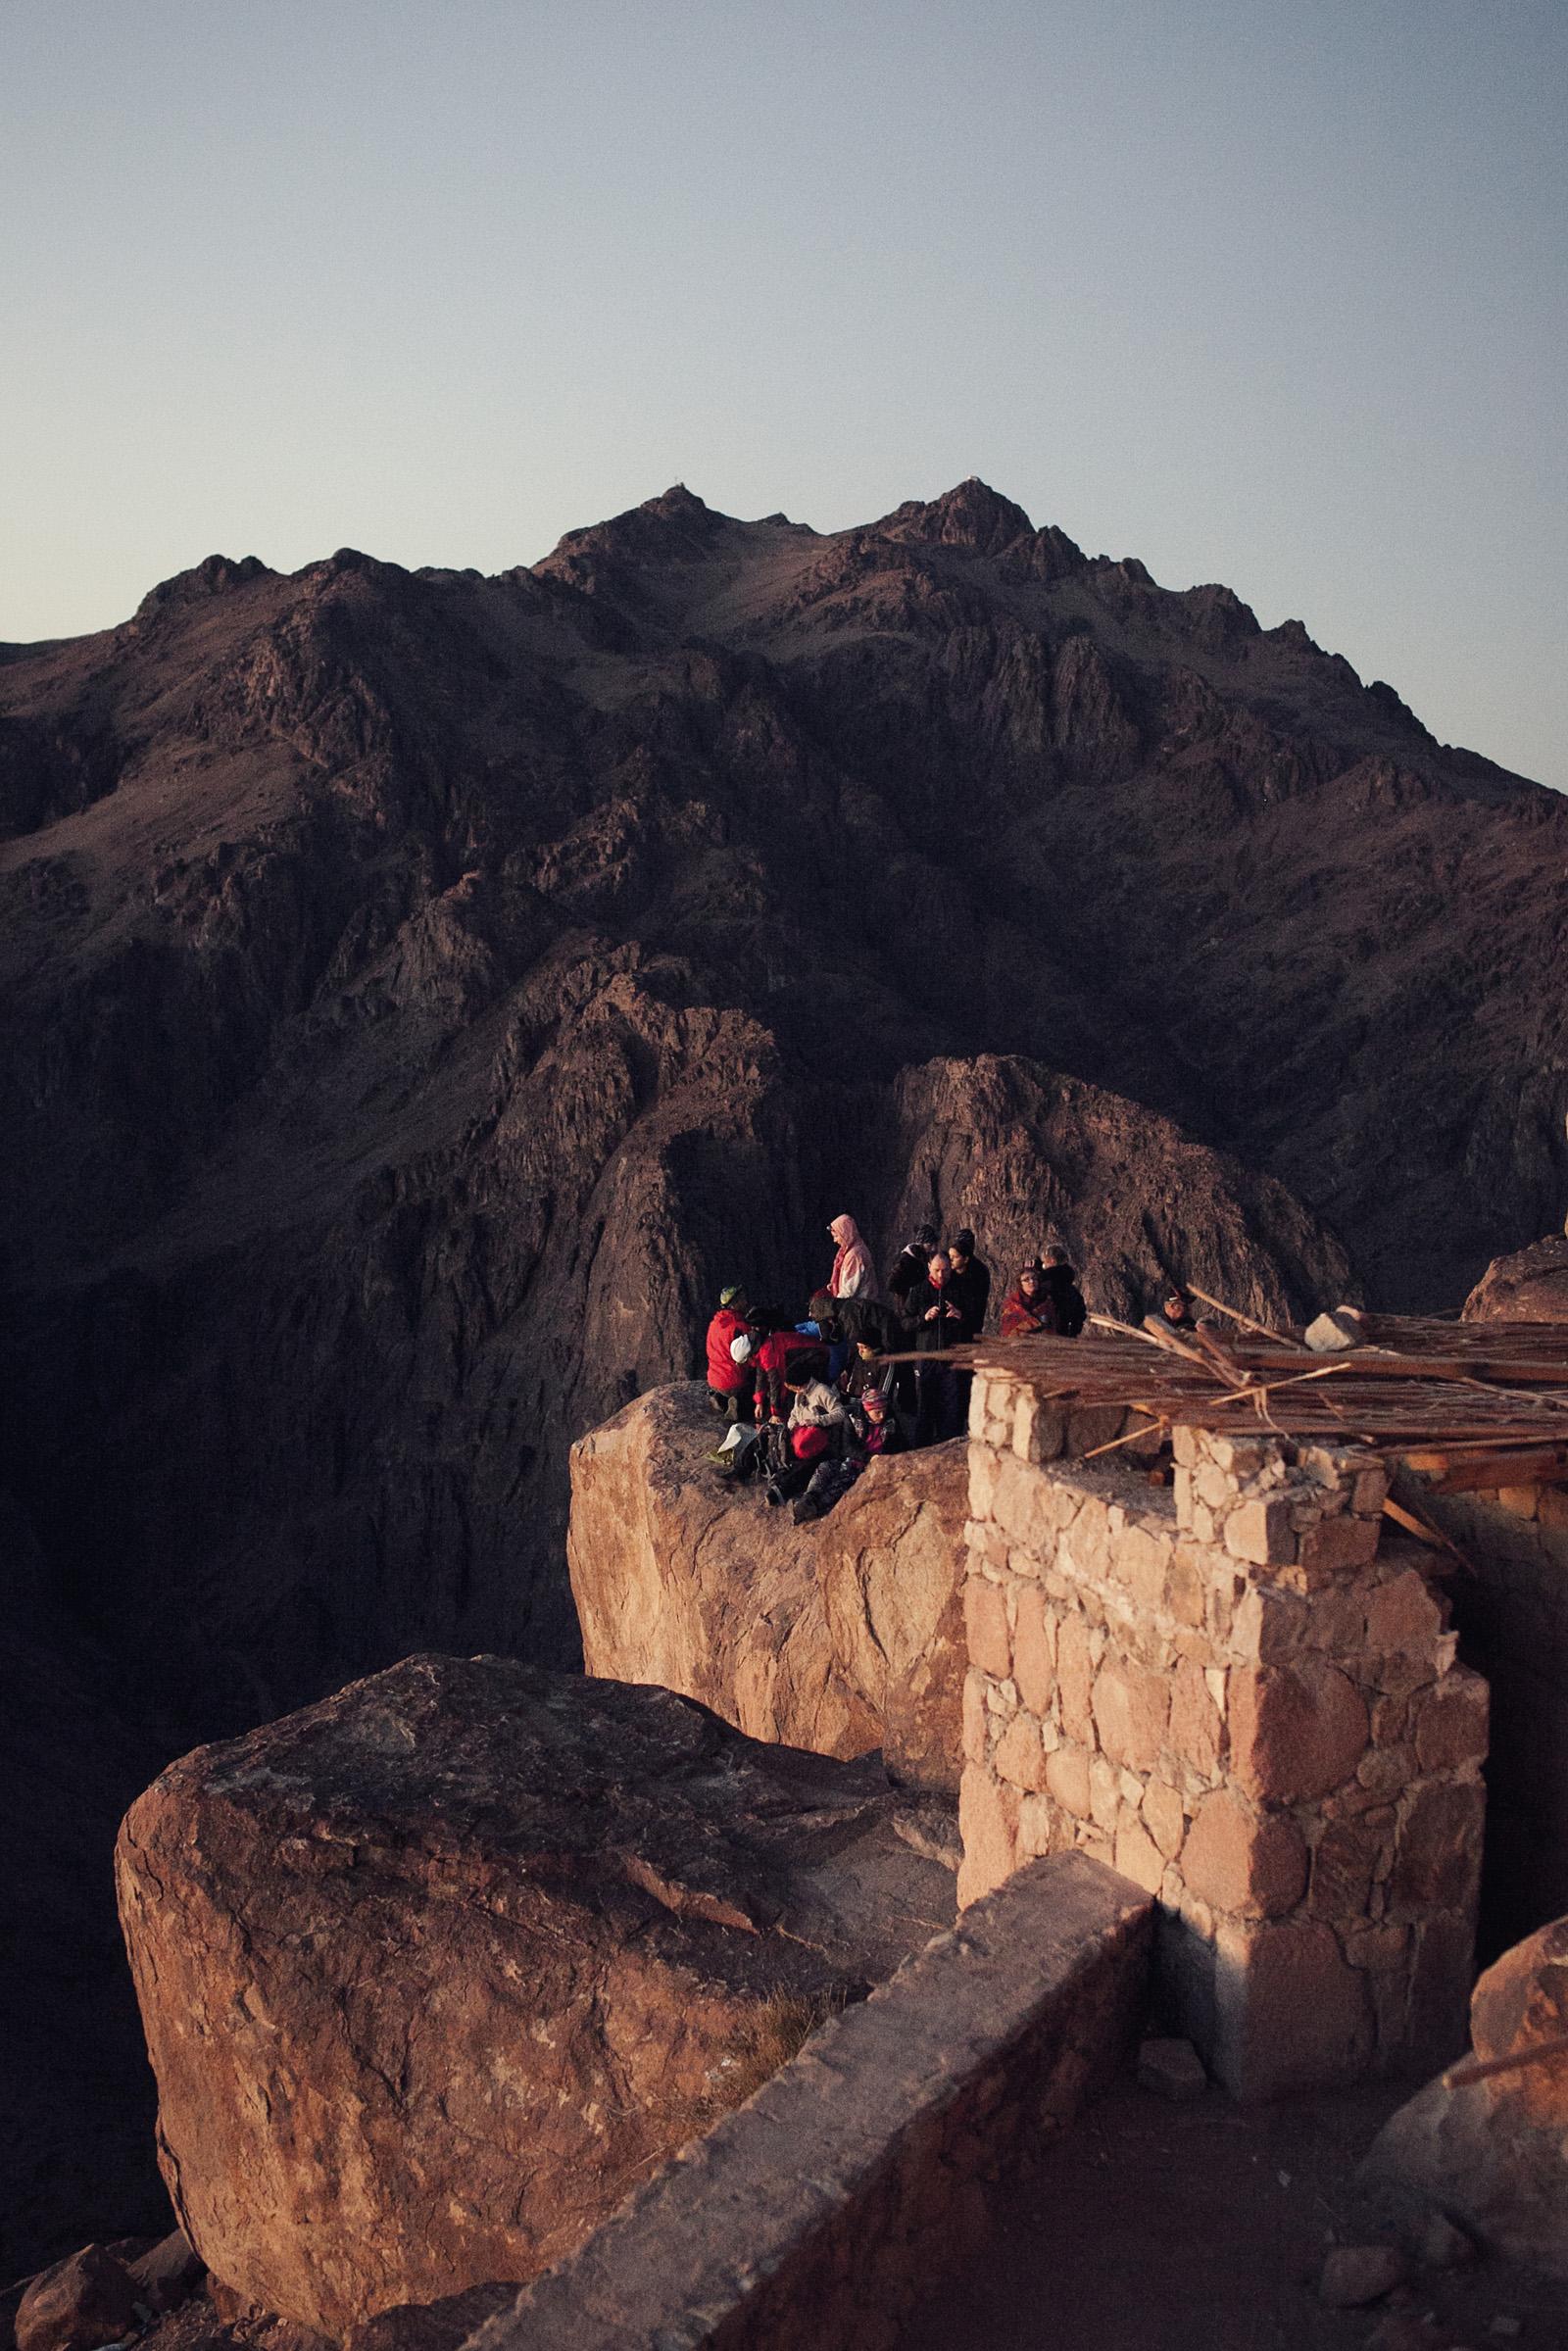 Tourists atop Mt Sinai witness the glory of the sunrise.